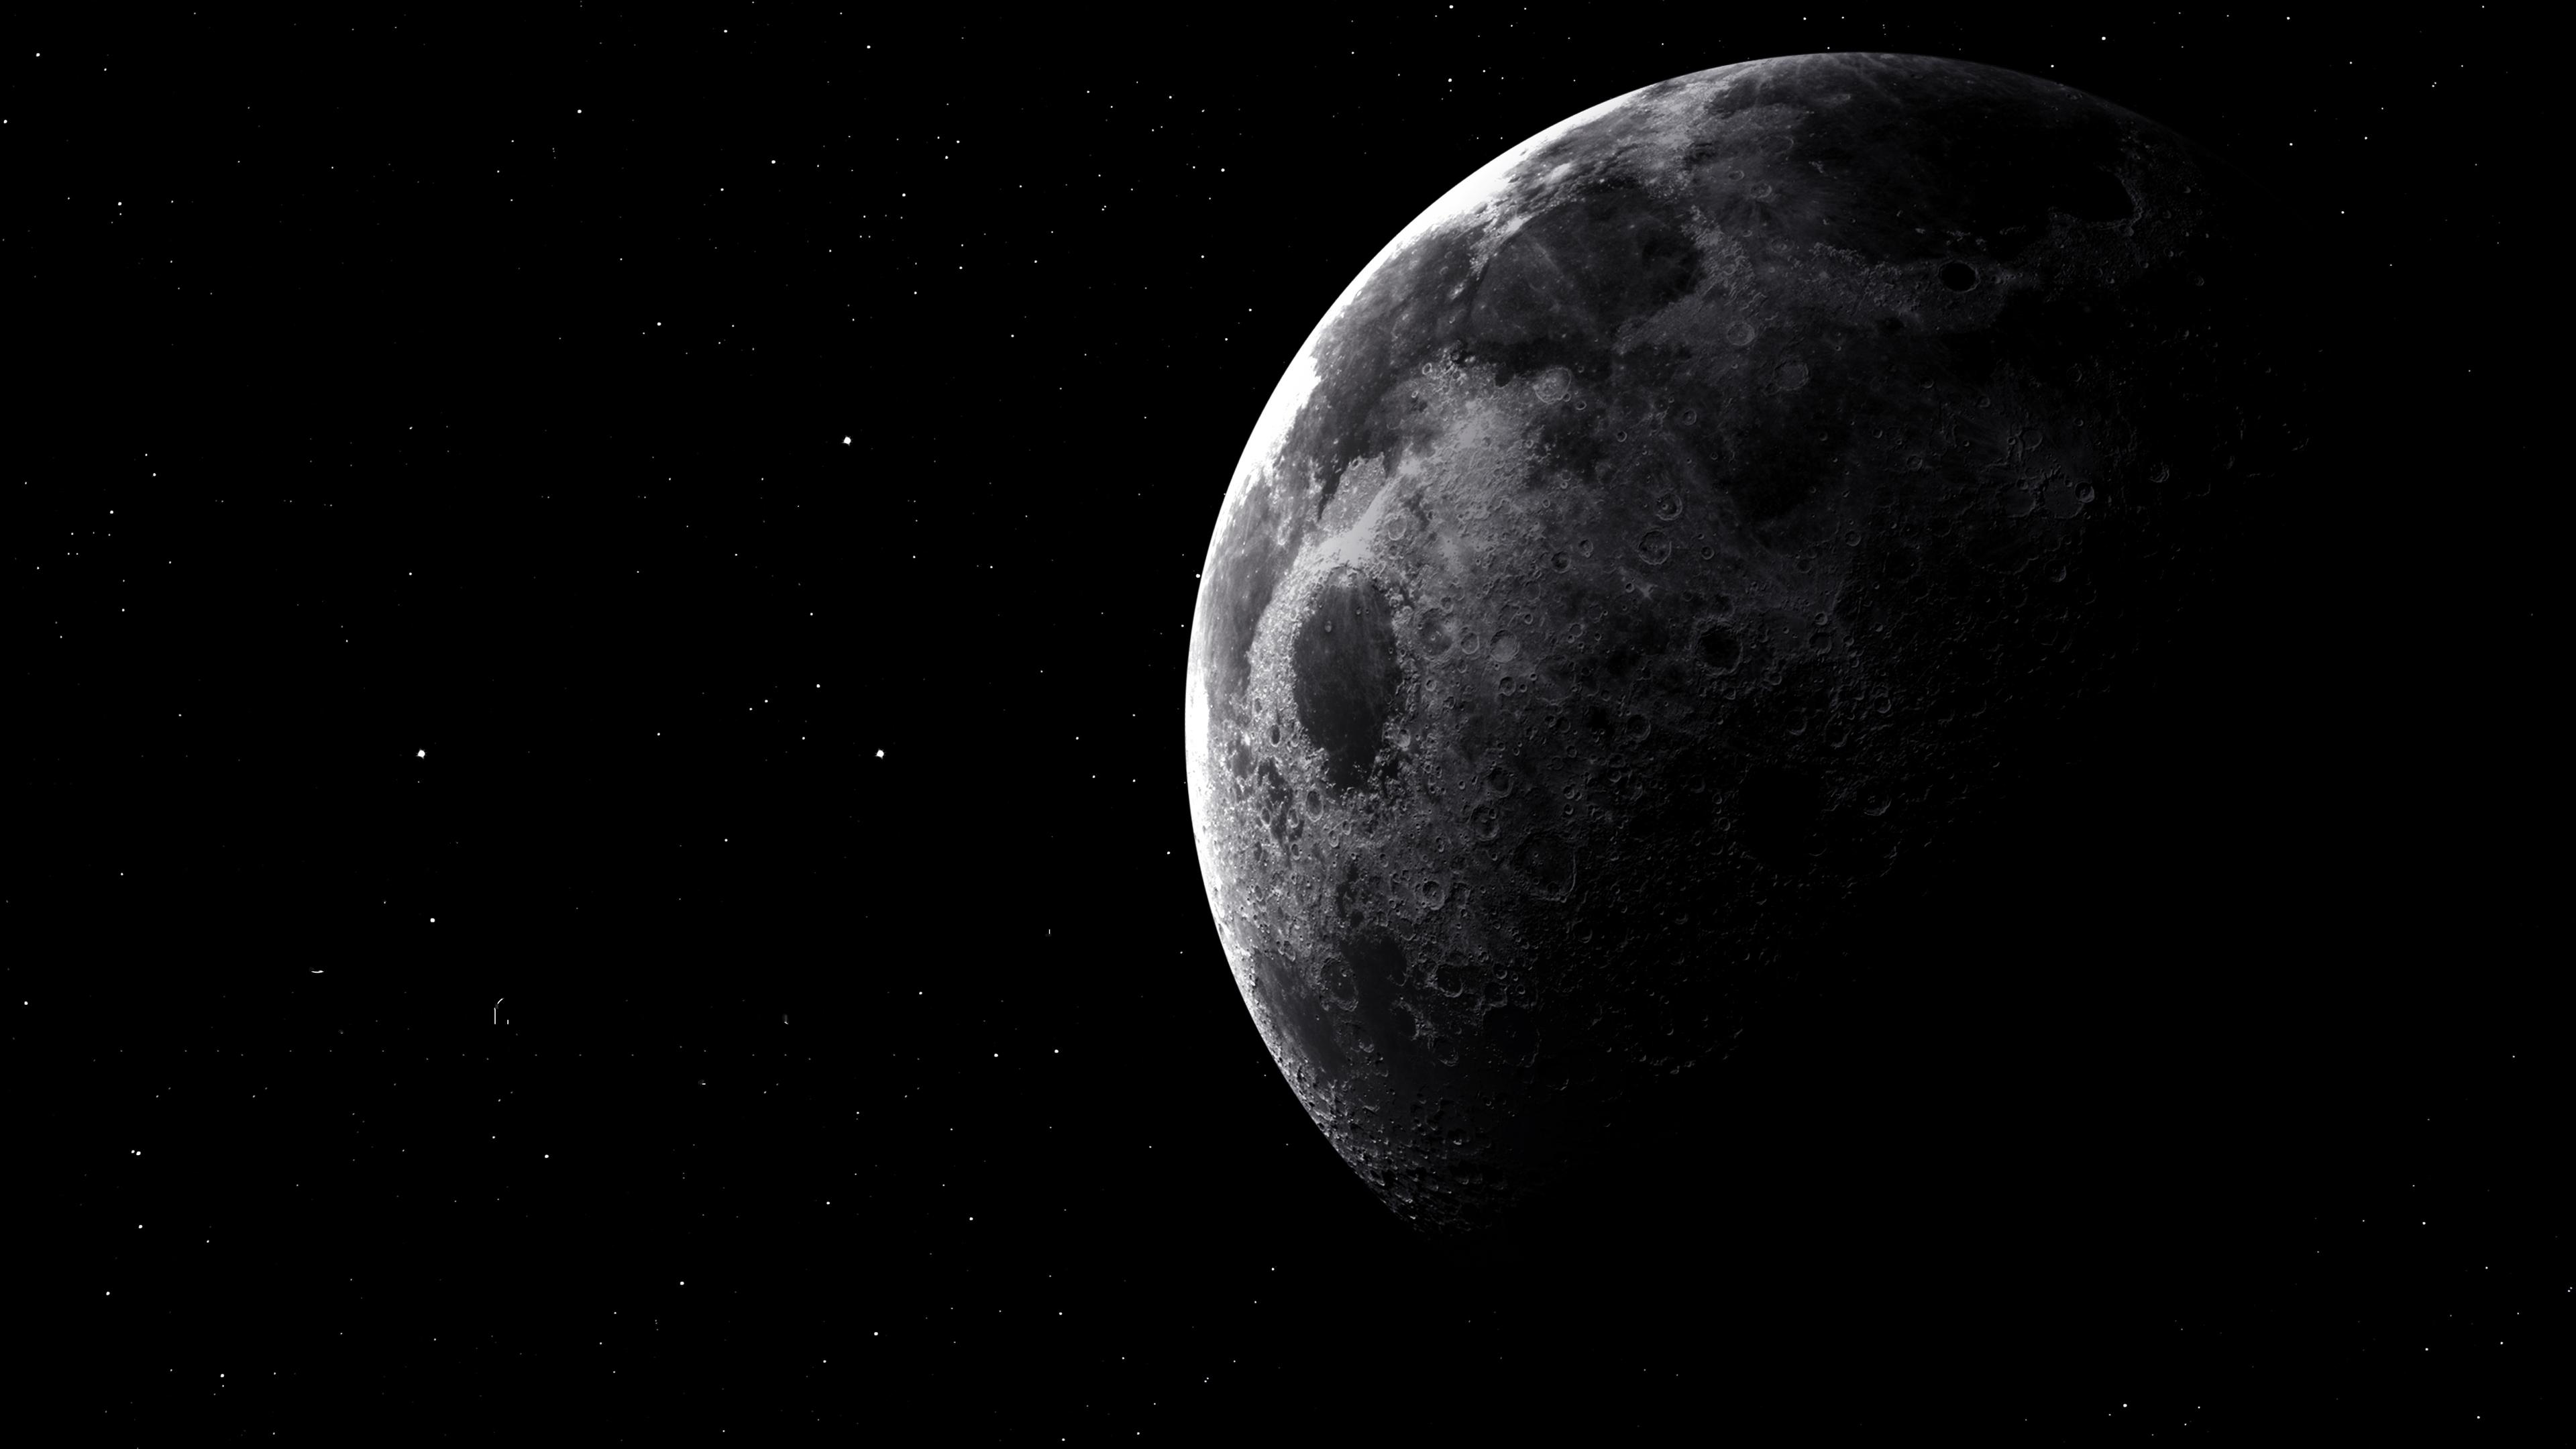 moon 5k 1538069565 - Moon 5k - stars wallpapers, planets wallpapers, moon wallpapers, hd-wallpapers, 5k wallpapers, 4k-wallpapers